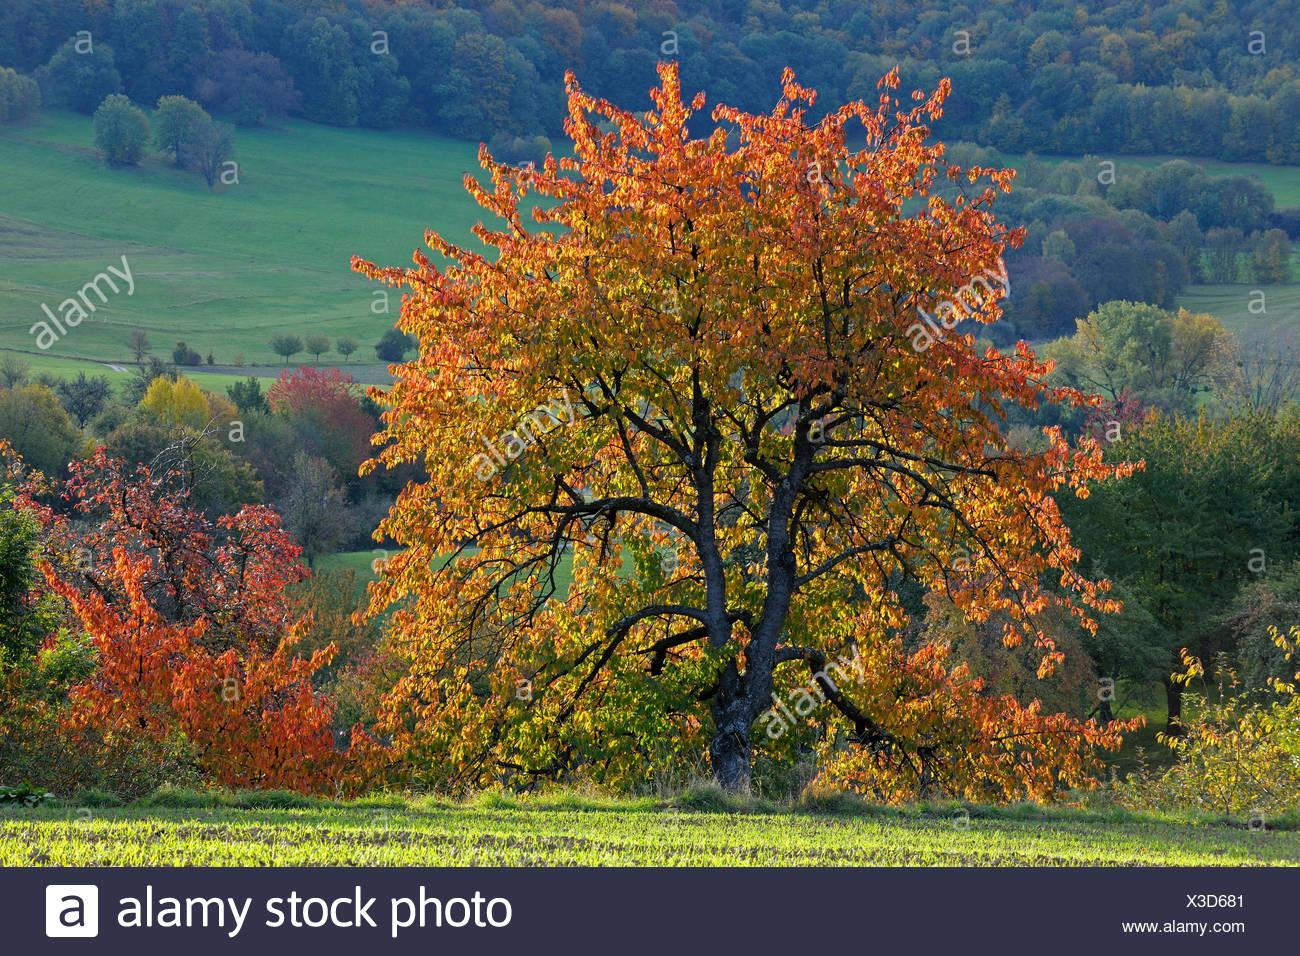 fruit tree meadow in autumn at the biosphere reserve Schwaebische Alb, Germany, Baden-Wuerttemberg - Stock Image